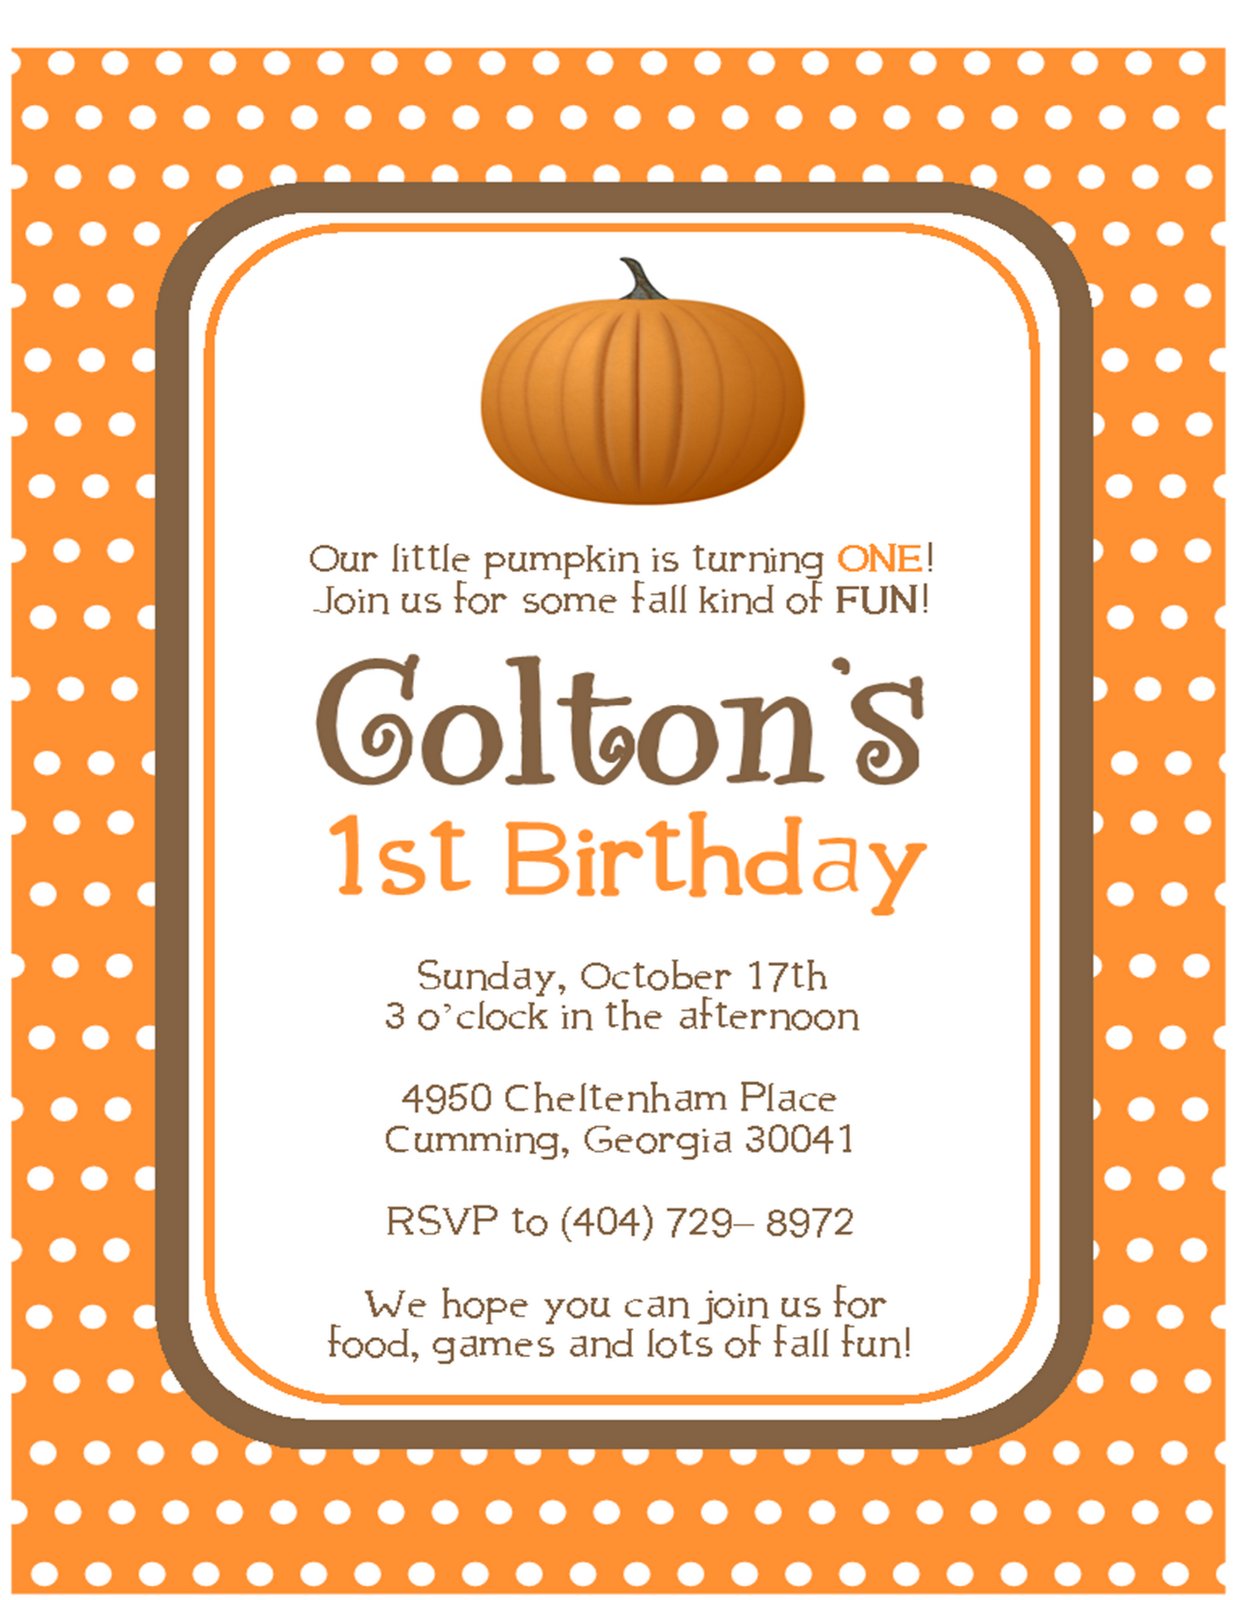 Fall Fun Pumpkin Invitations Sweet Peach Paperie